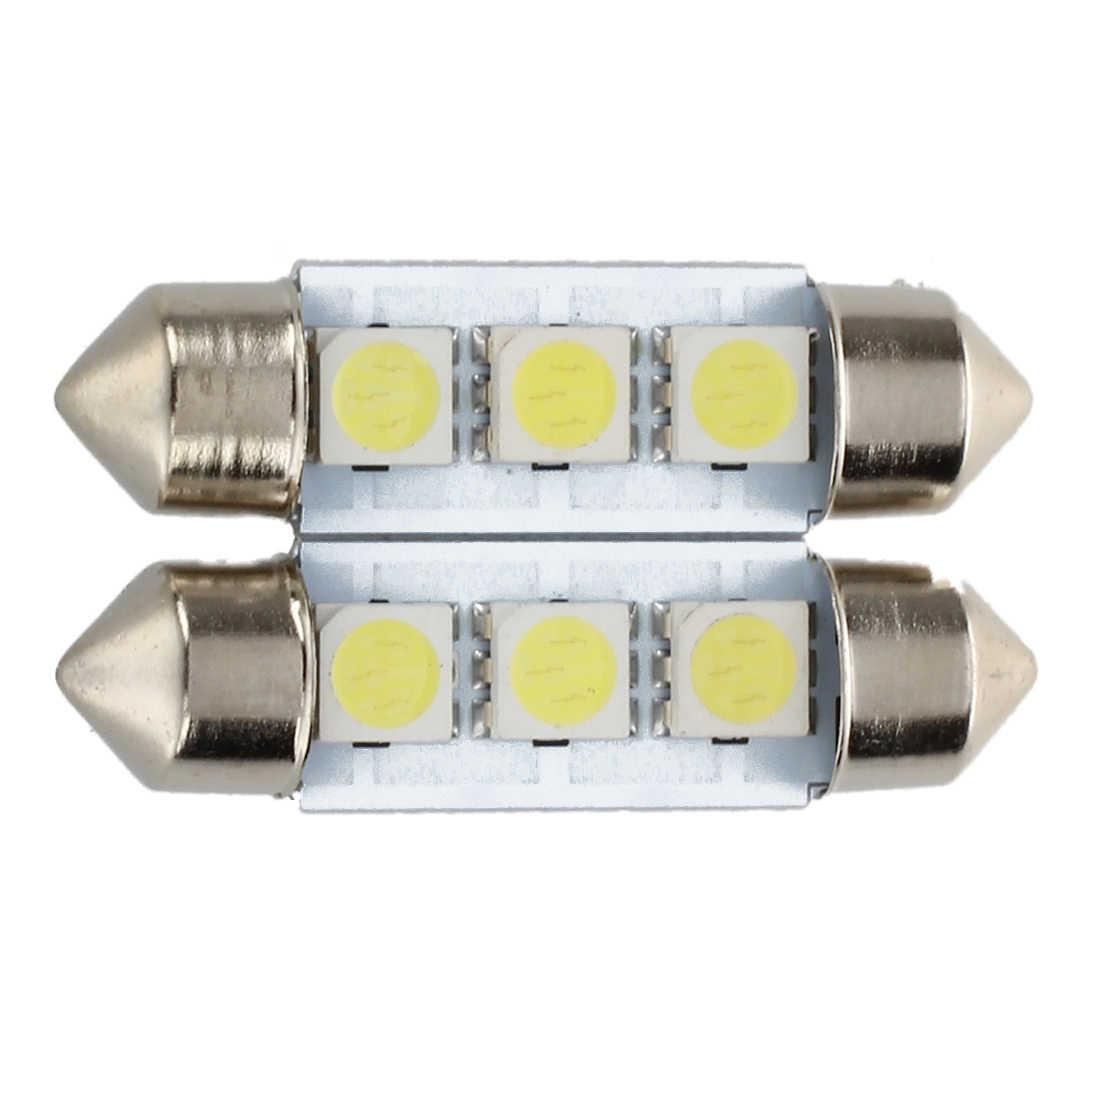 2X C5W 3 LED SMD 5050 34 Mm Xenon Putih Lampu Plat Antar-jemput Festoon Dome Langit-langit Lampu Mobil